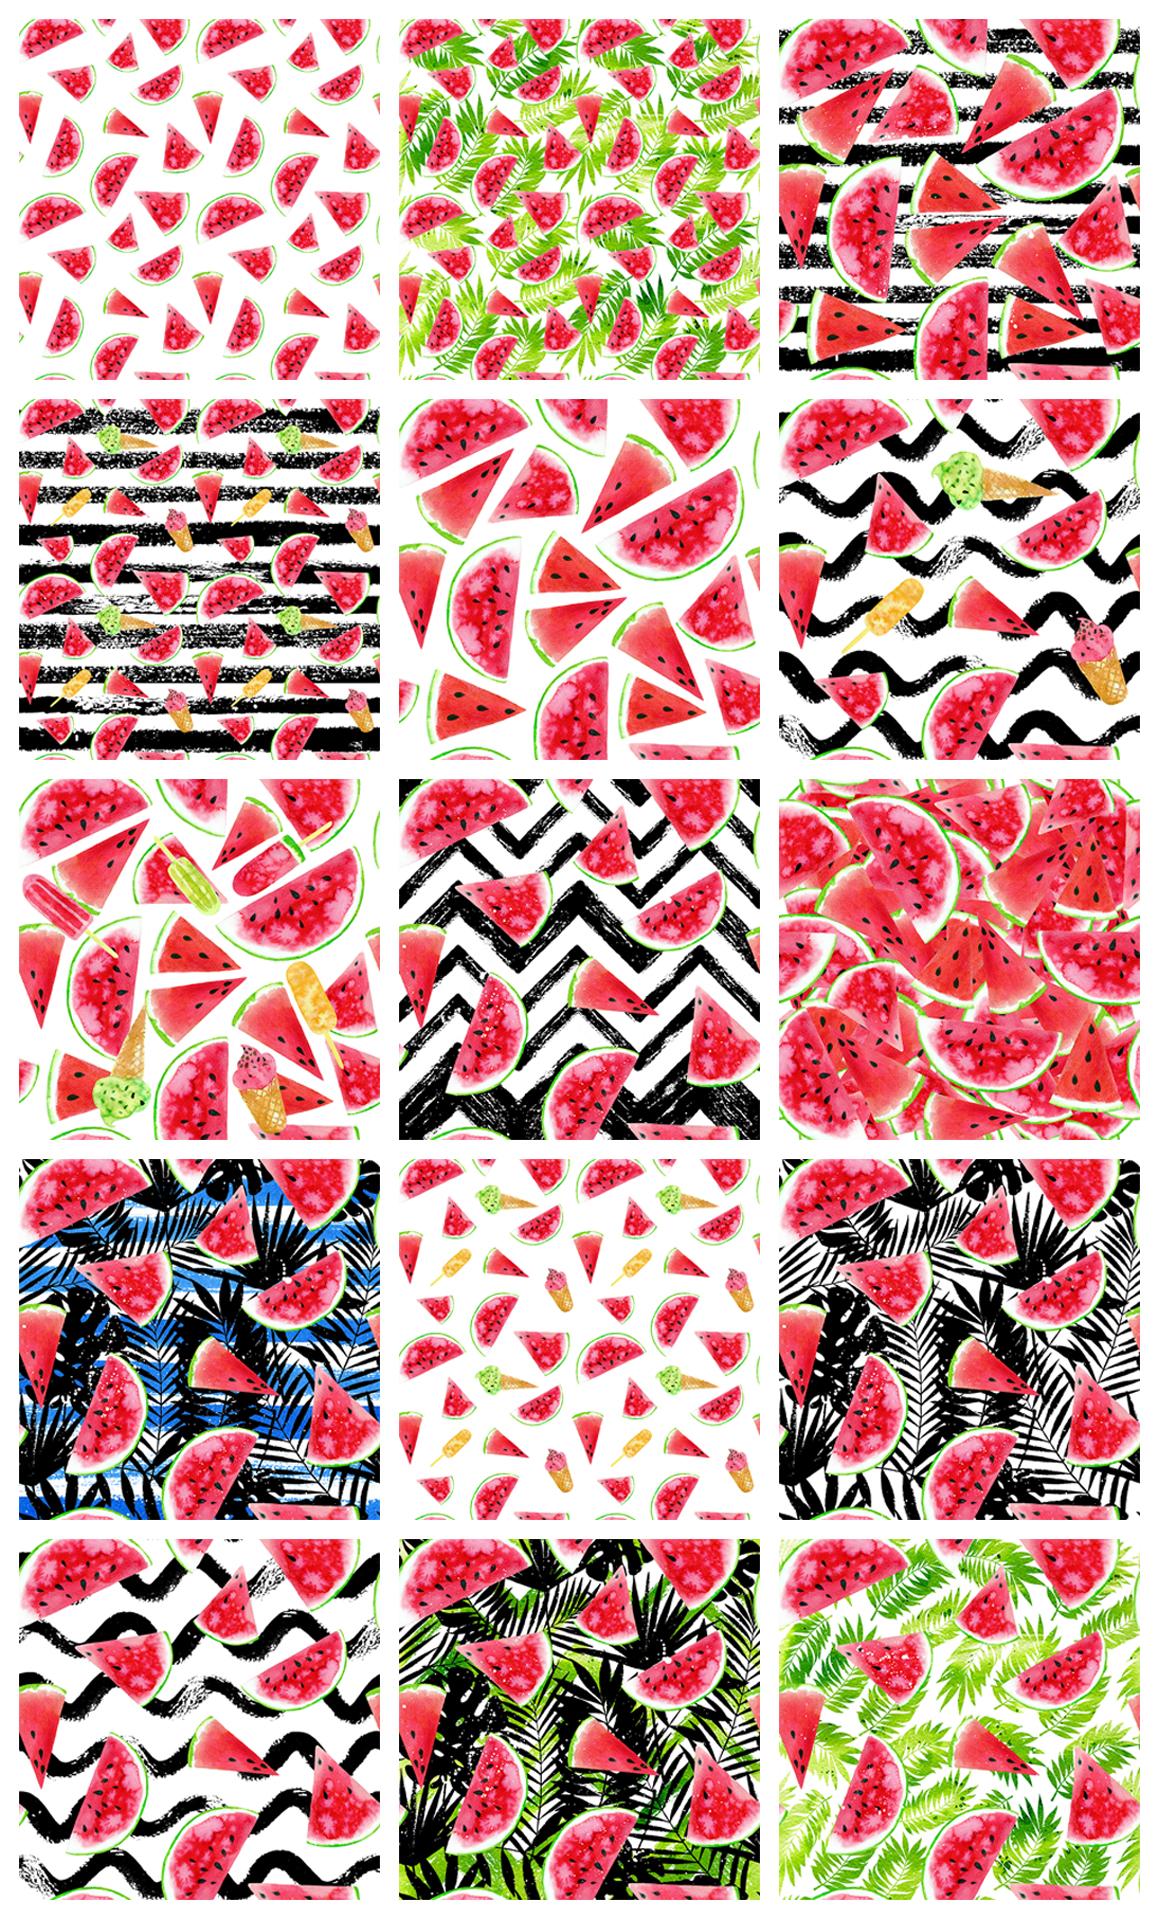 Watercolor Watermelons & Ice-creams example image 8